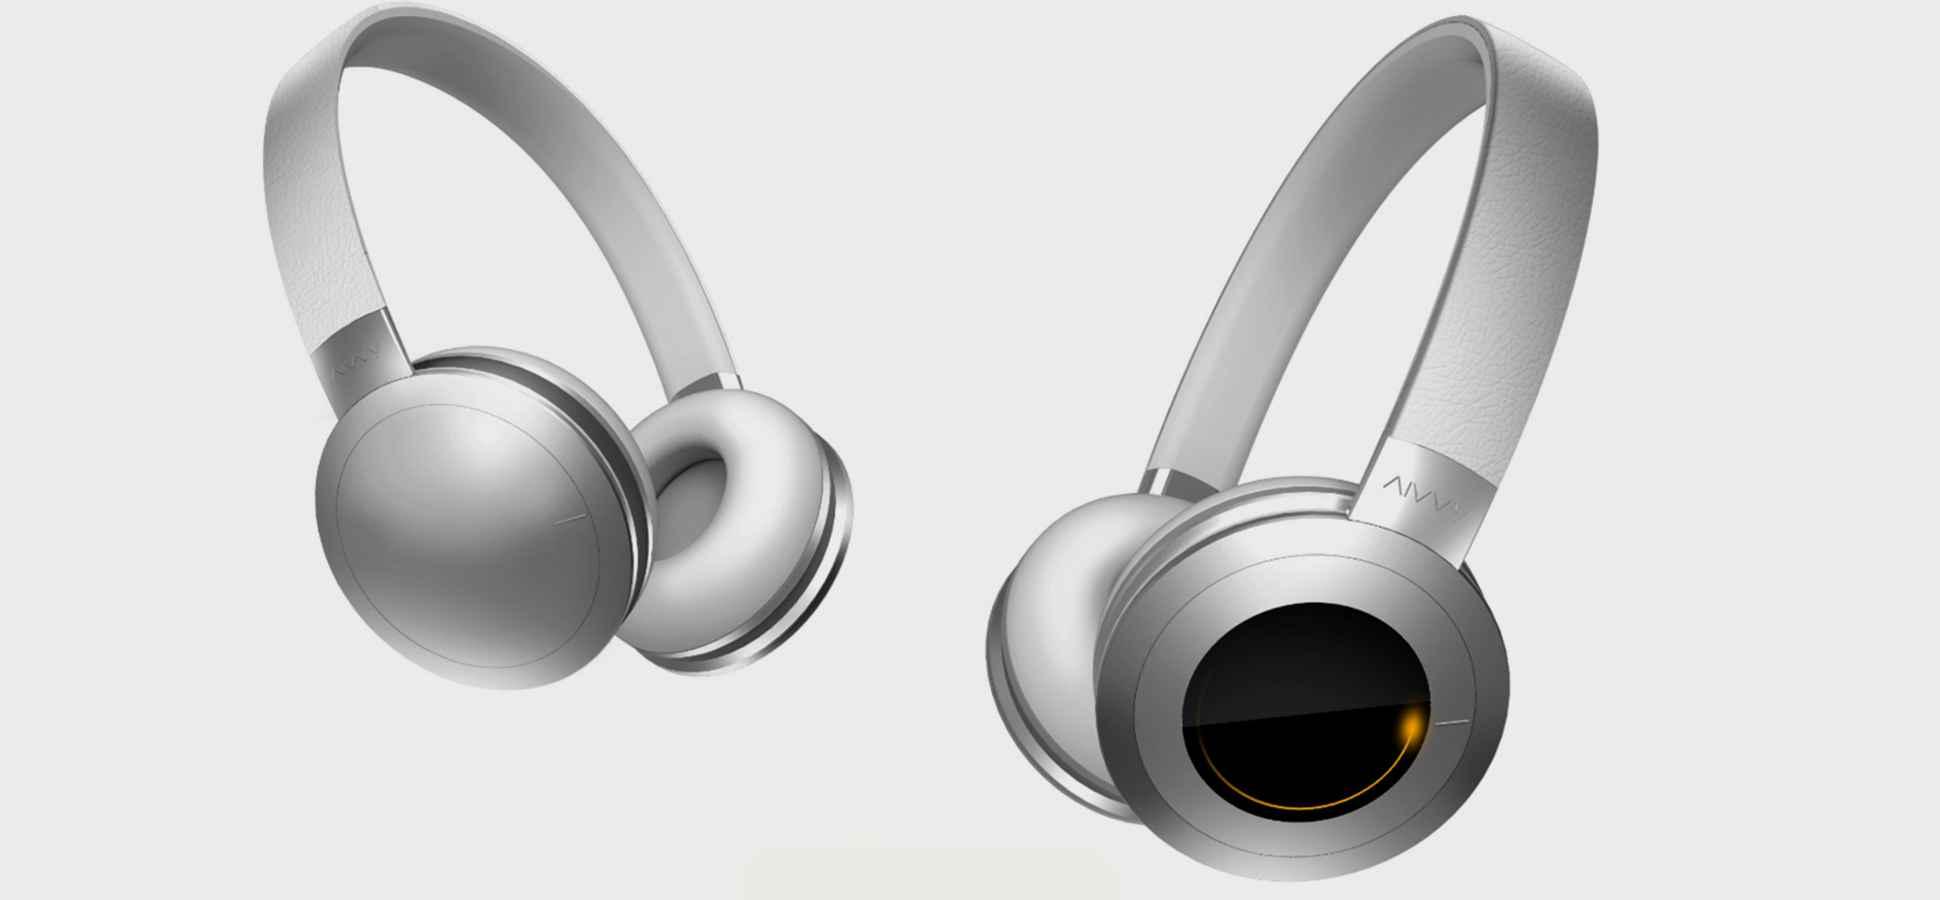 How a Team of Music Execs Built the World's Coolest Headphones